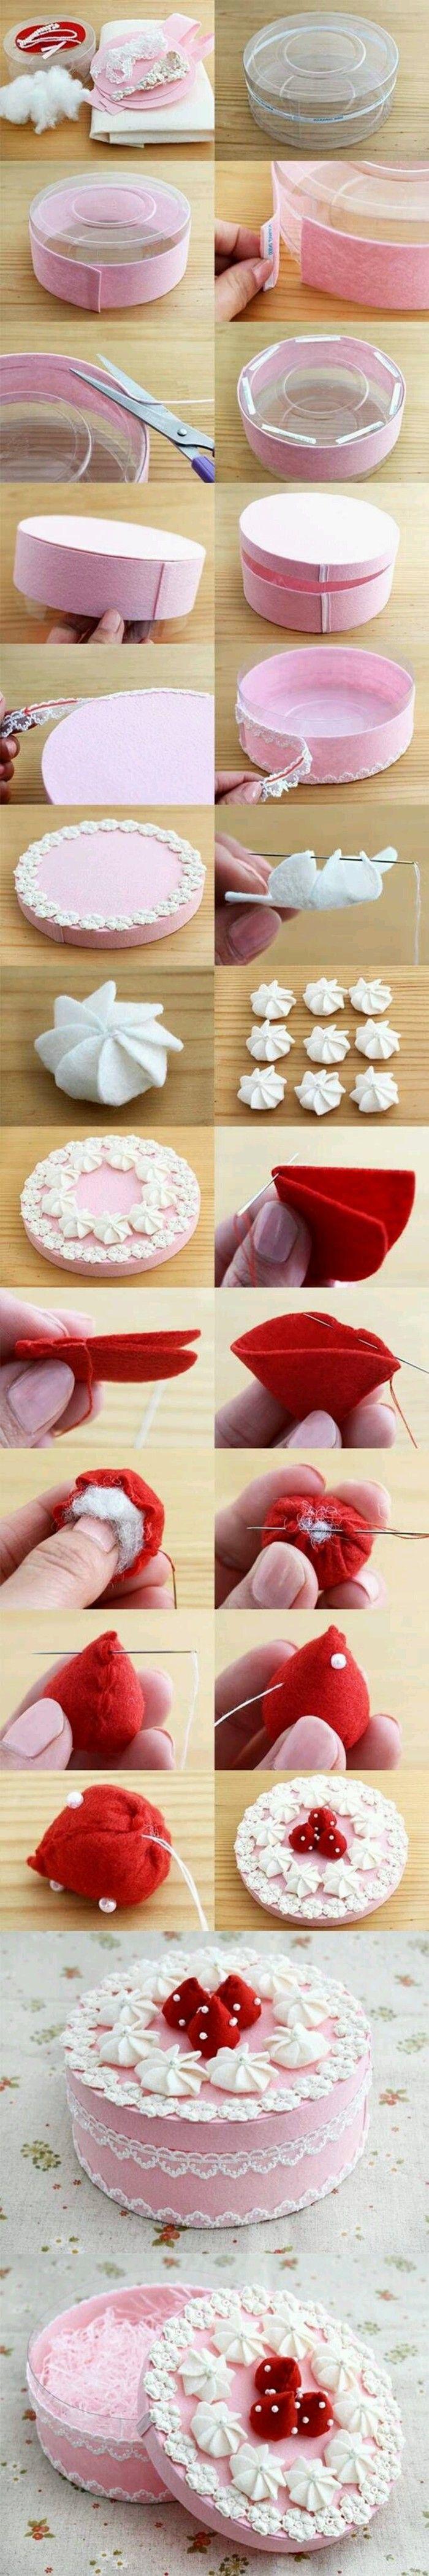 diy shabby chic cake box - handmade - home decor idea